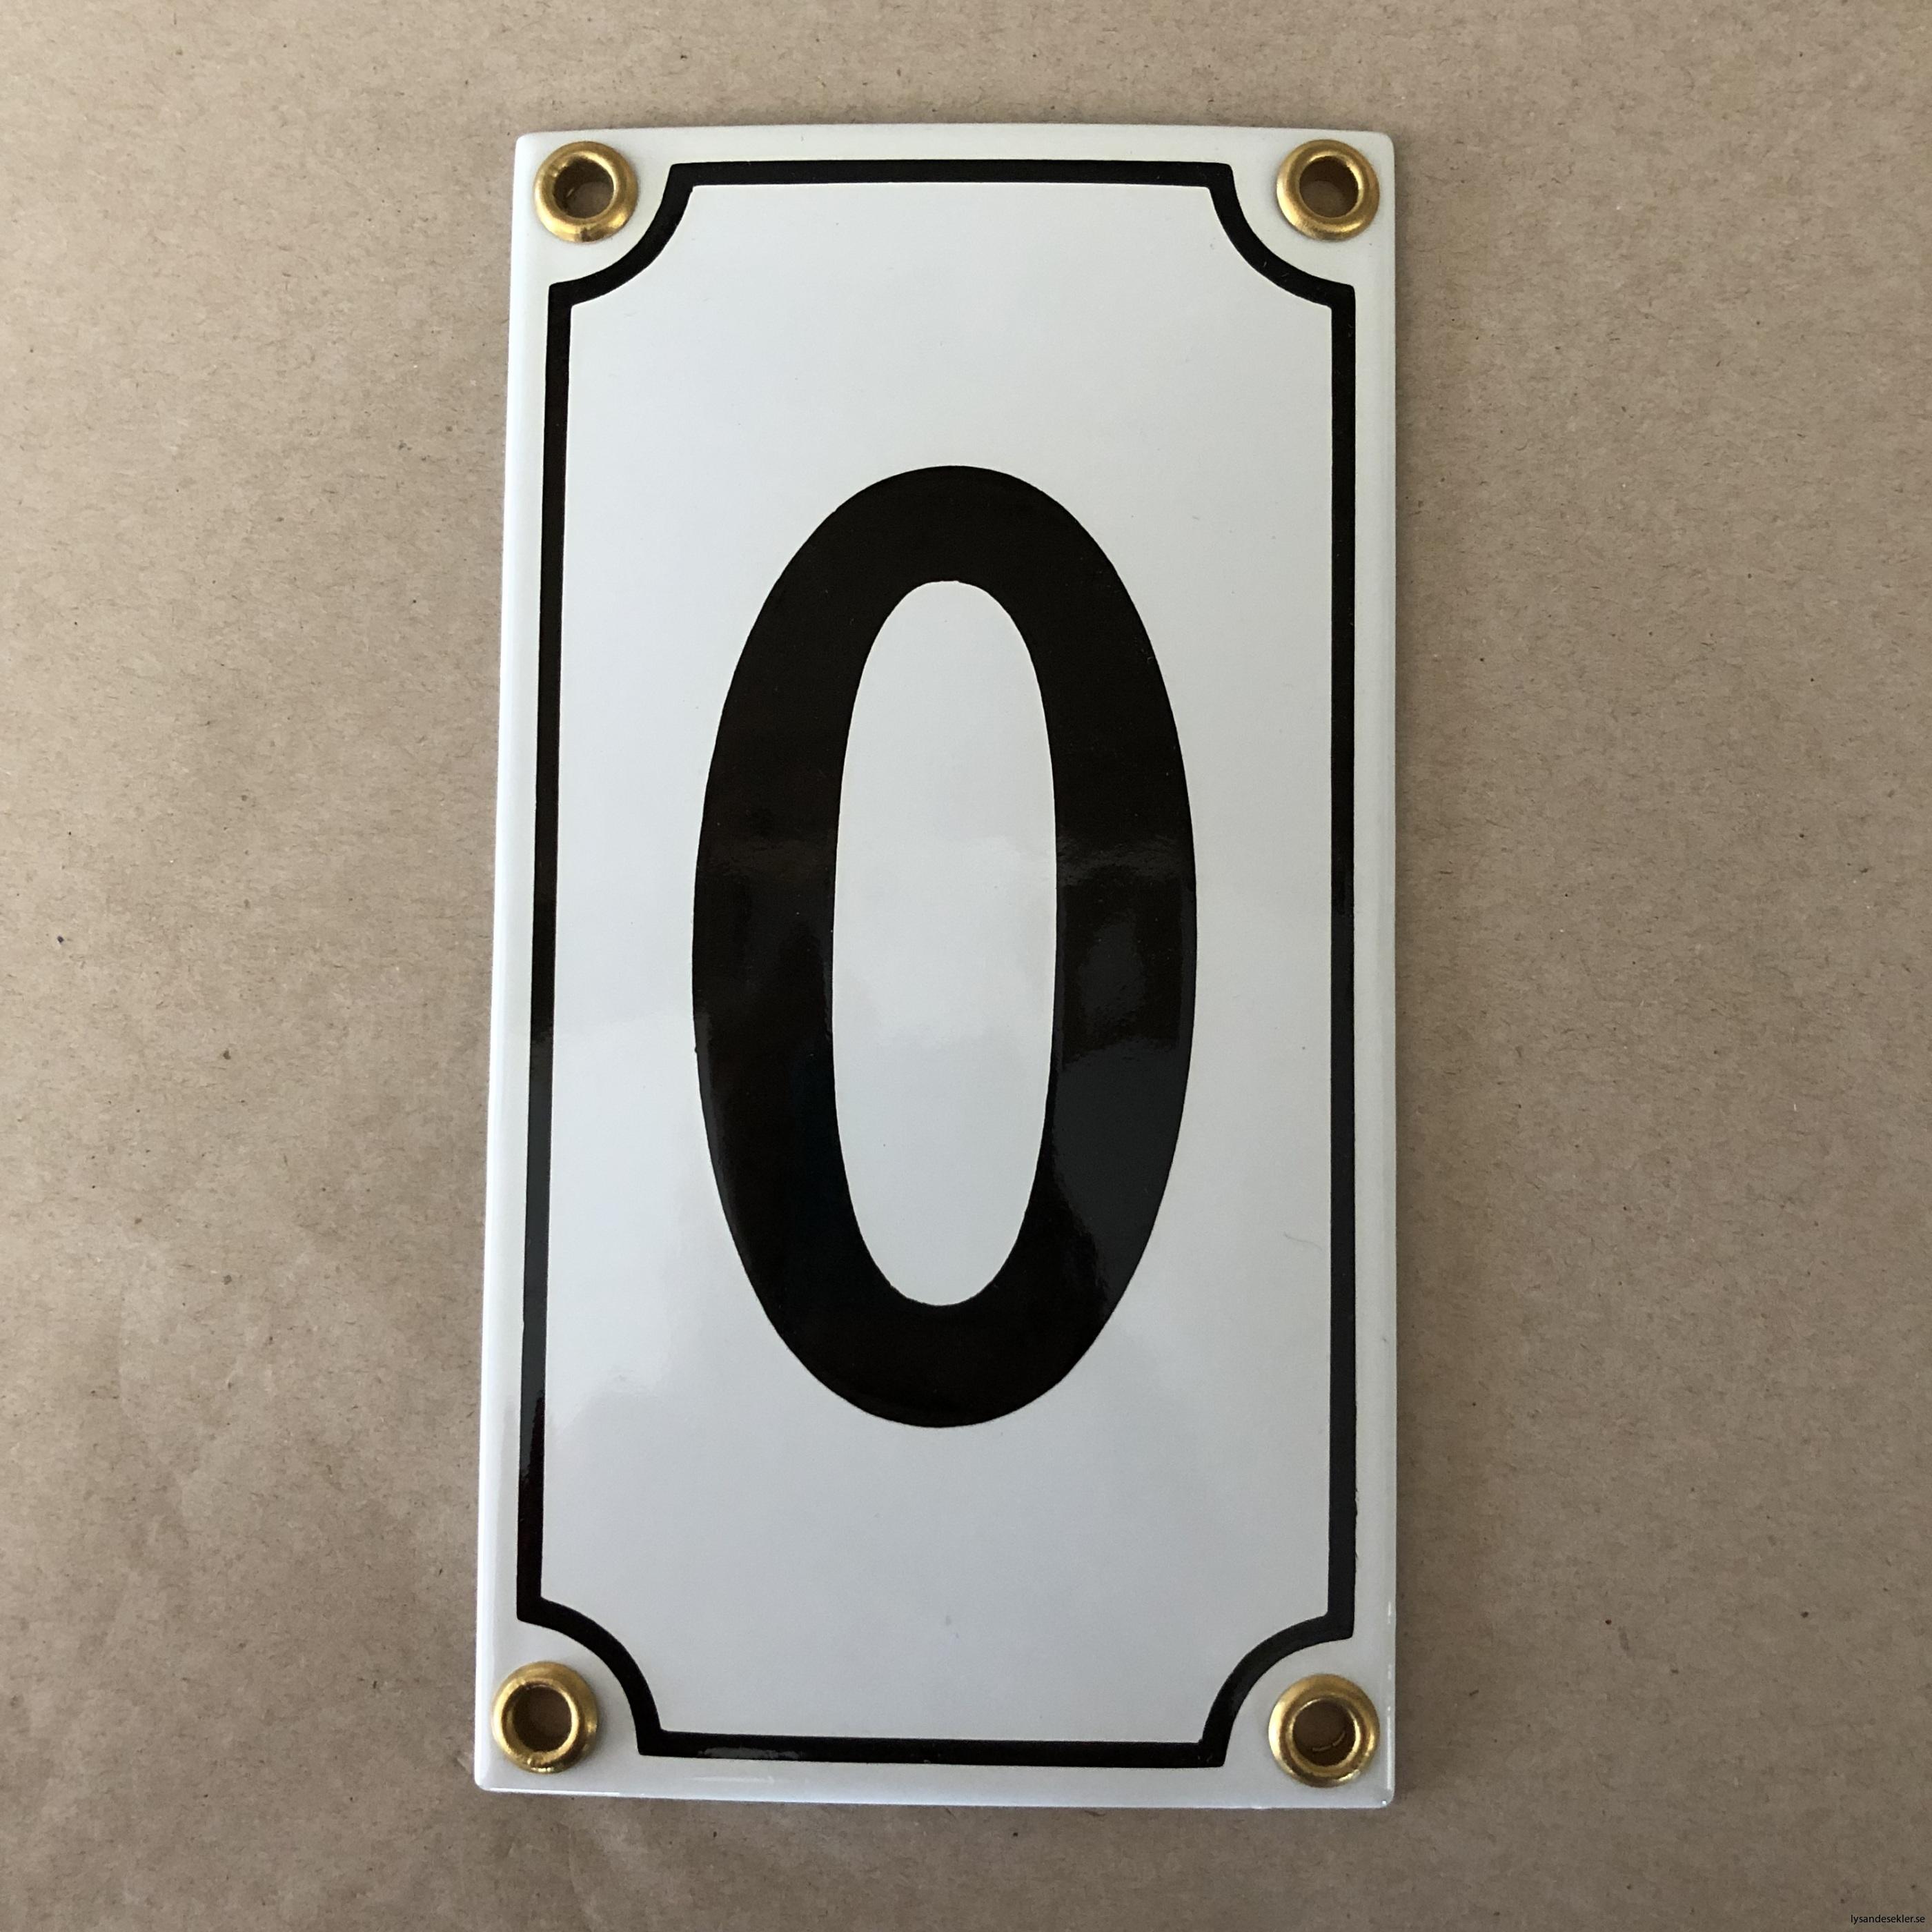 emaljsiffra siffra i emalj fasadsiffra nummer3